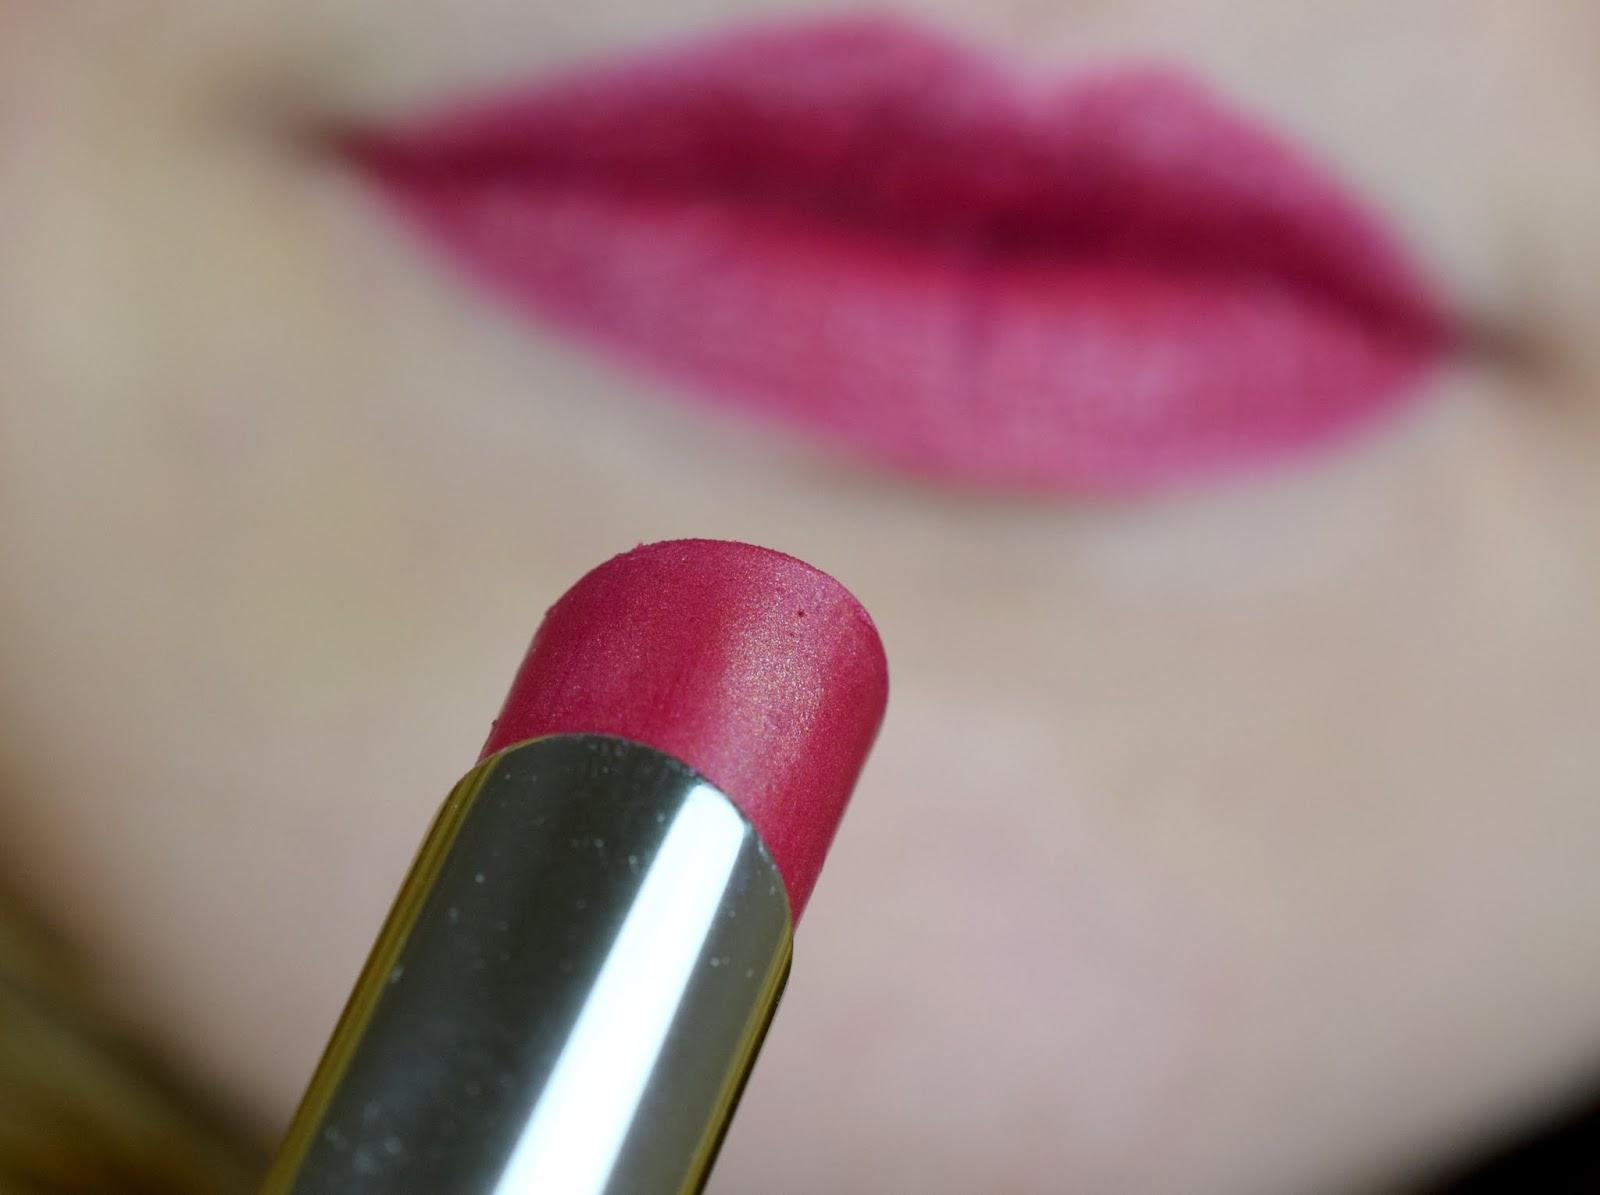 Kiko Daring Game Kollektion Ace of Diamond Lipstick Distinct Golden Hibiscus